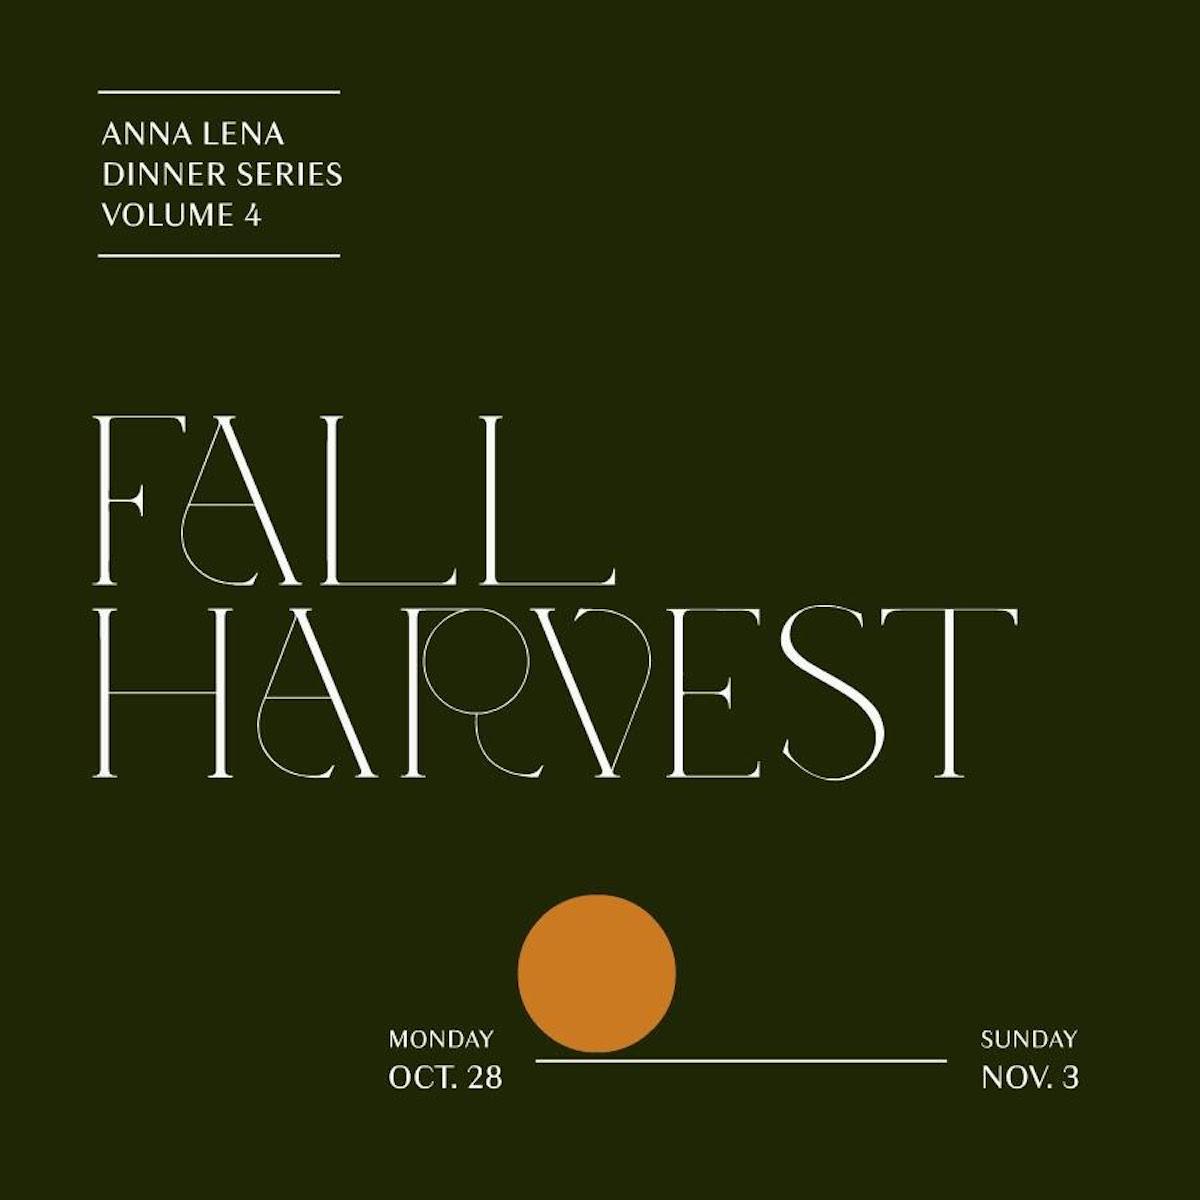 AnnaLena Dinner Series Volume 004: Fall Harvest ~ October 28 to November 3rd